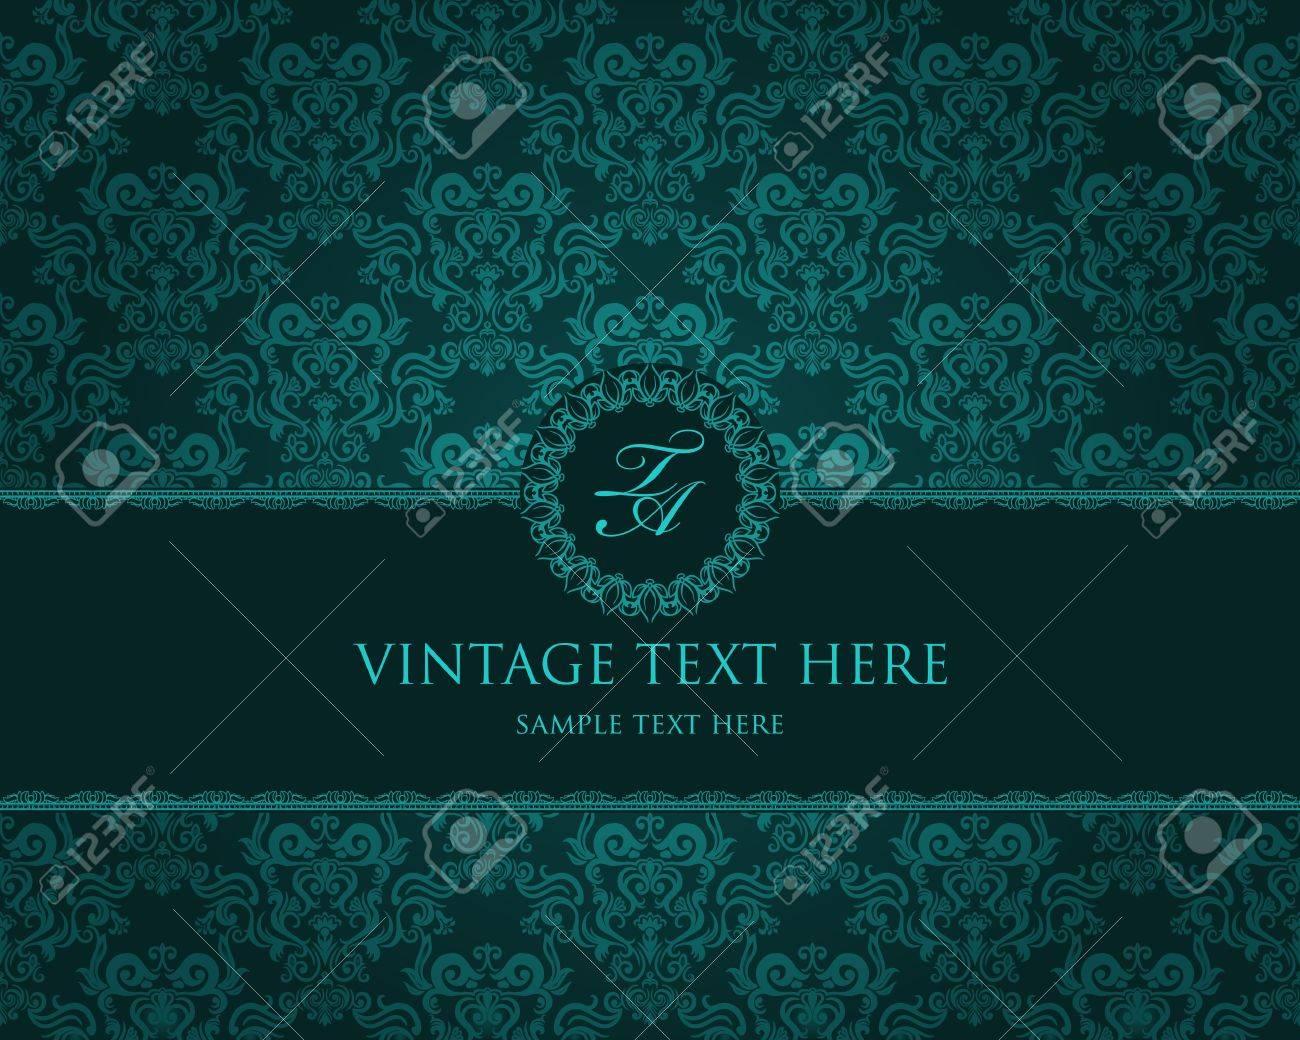 Detailed vintage card with damask wallpaper on beige grunge background Stock Vector - 12806803